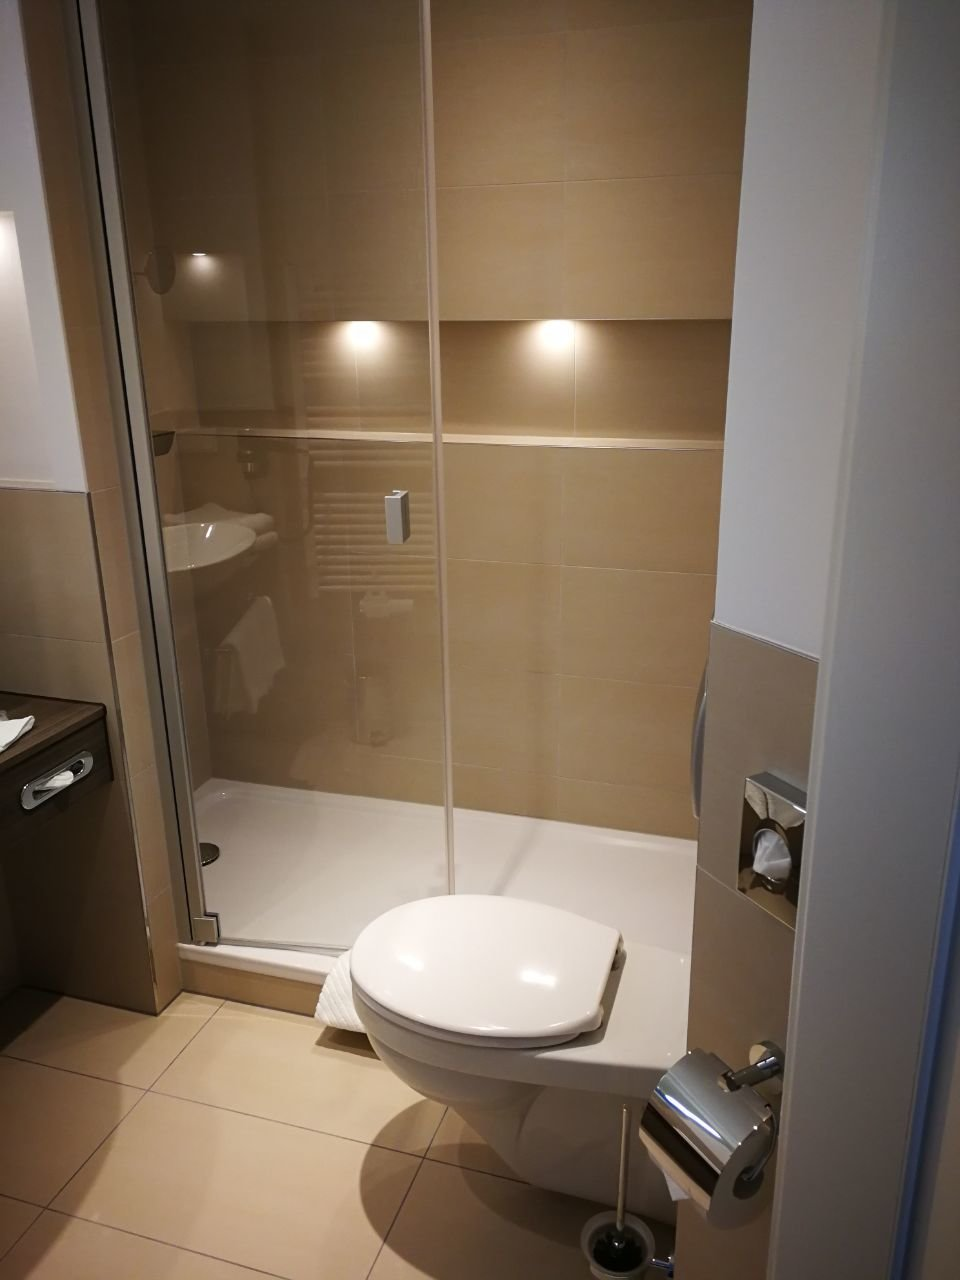 Wellness special im ringhotel villa margarete p hl gmbh for Badezimmer quelle